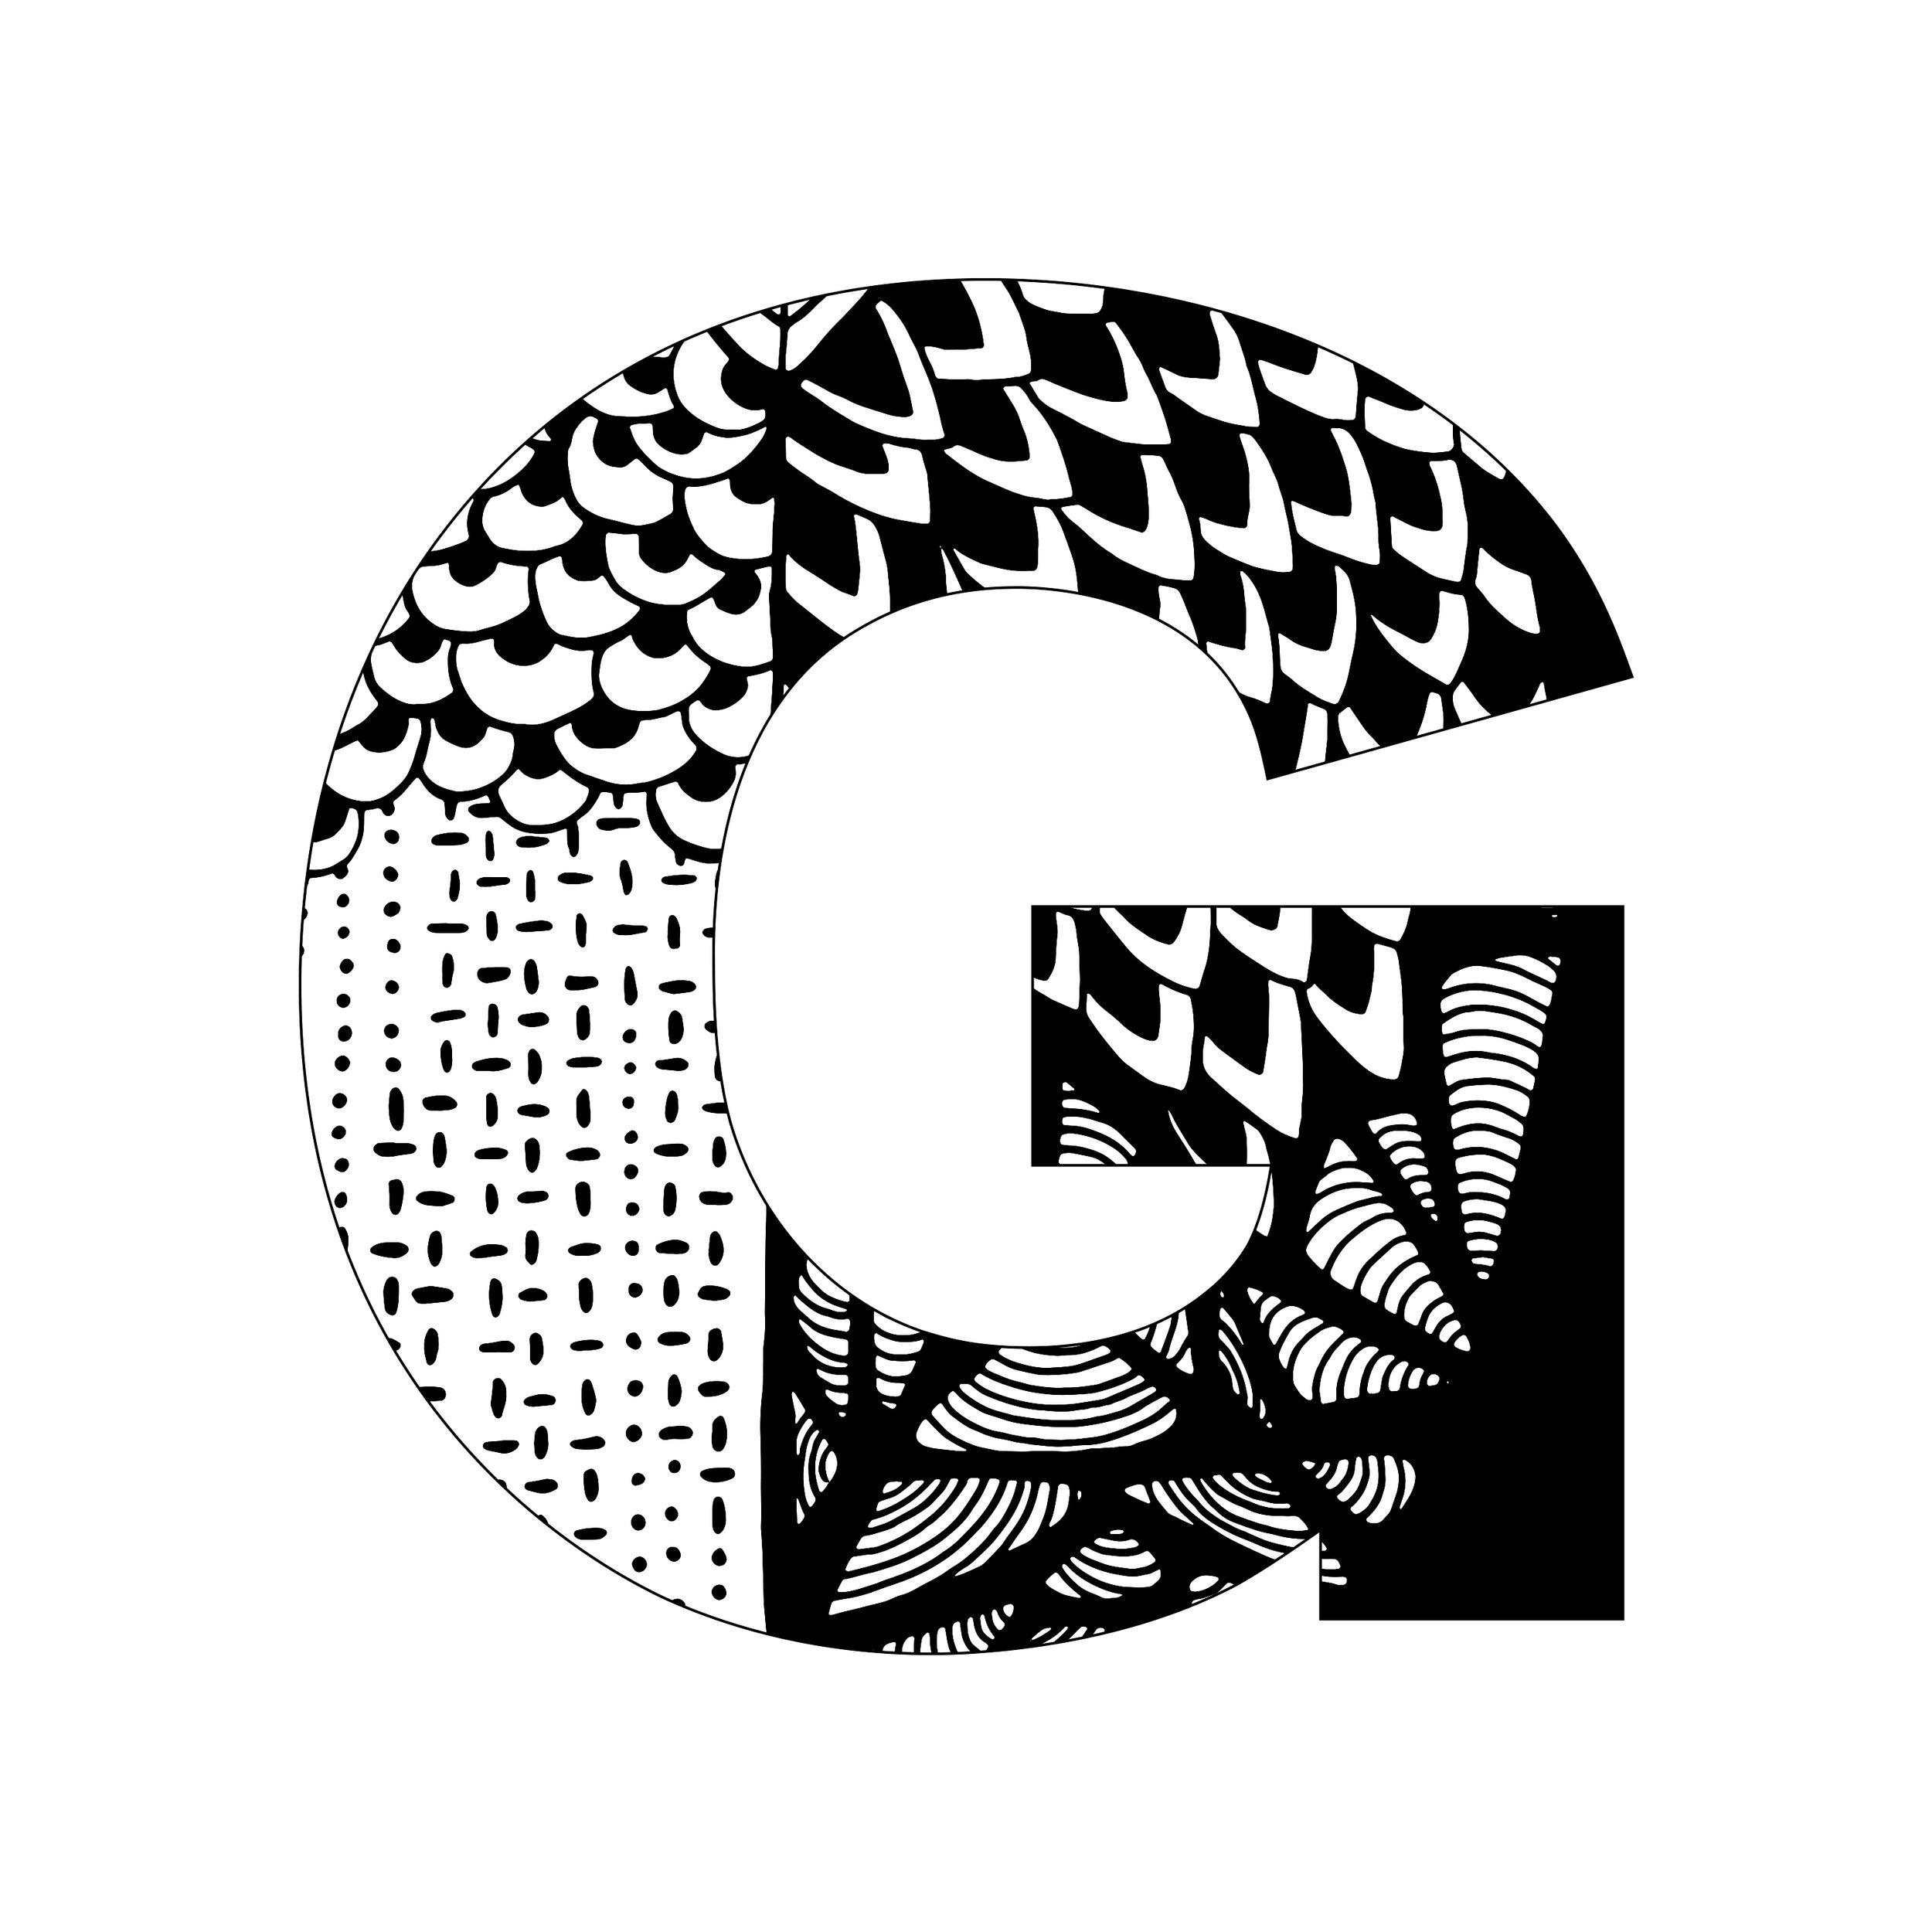 G 1-1.jpg